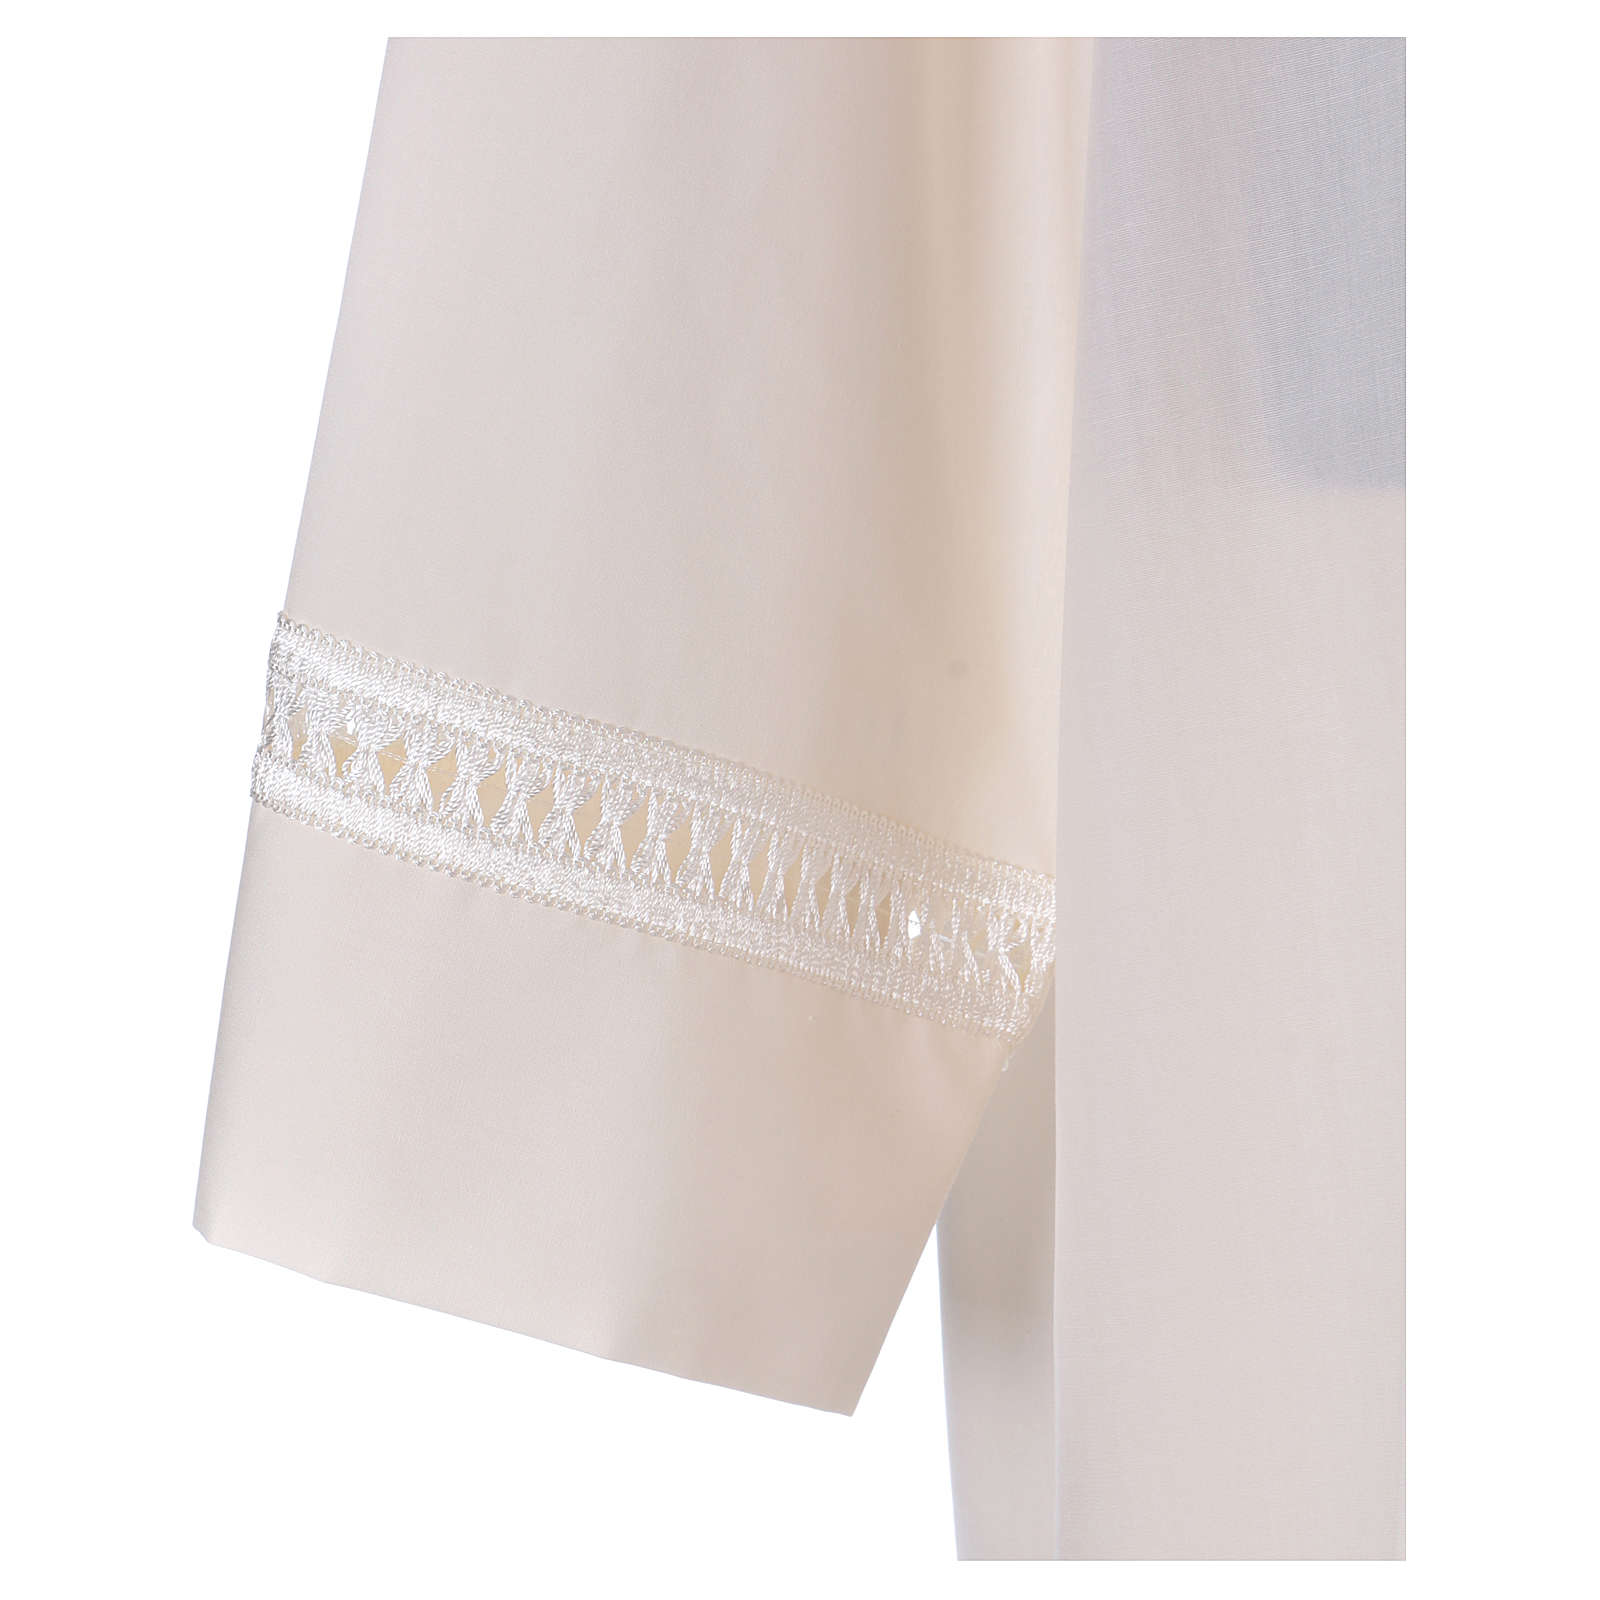 Alba 65% poliéster 35% algodón marfil alfiletero cremallera hombro 4